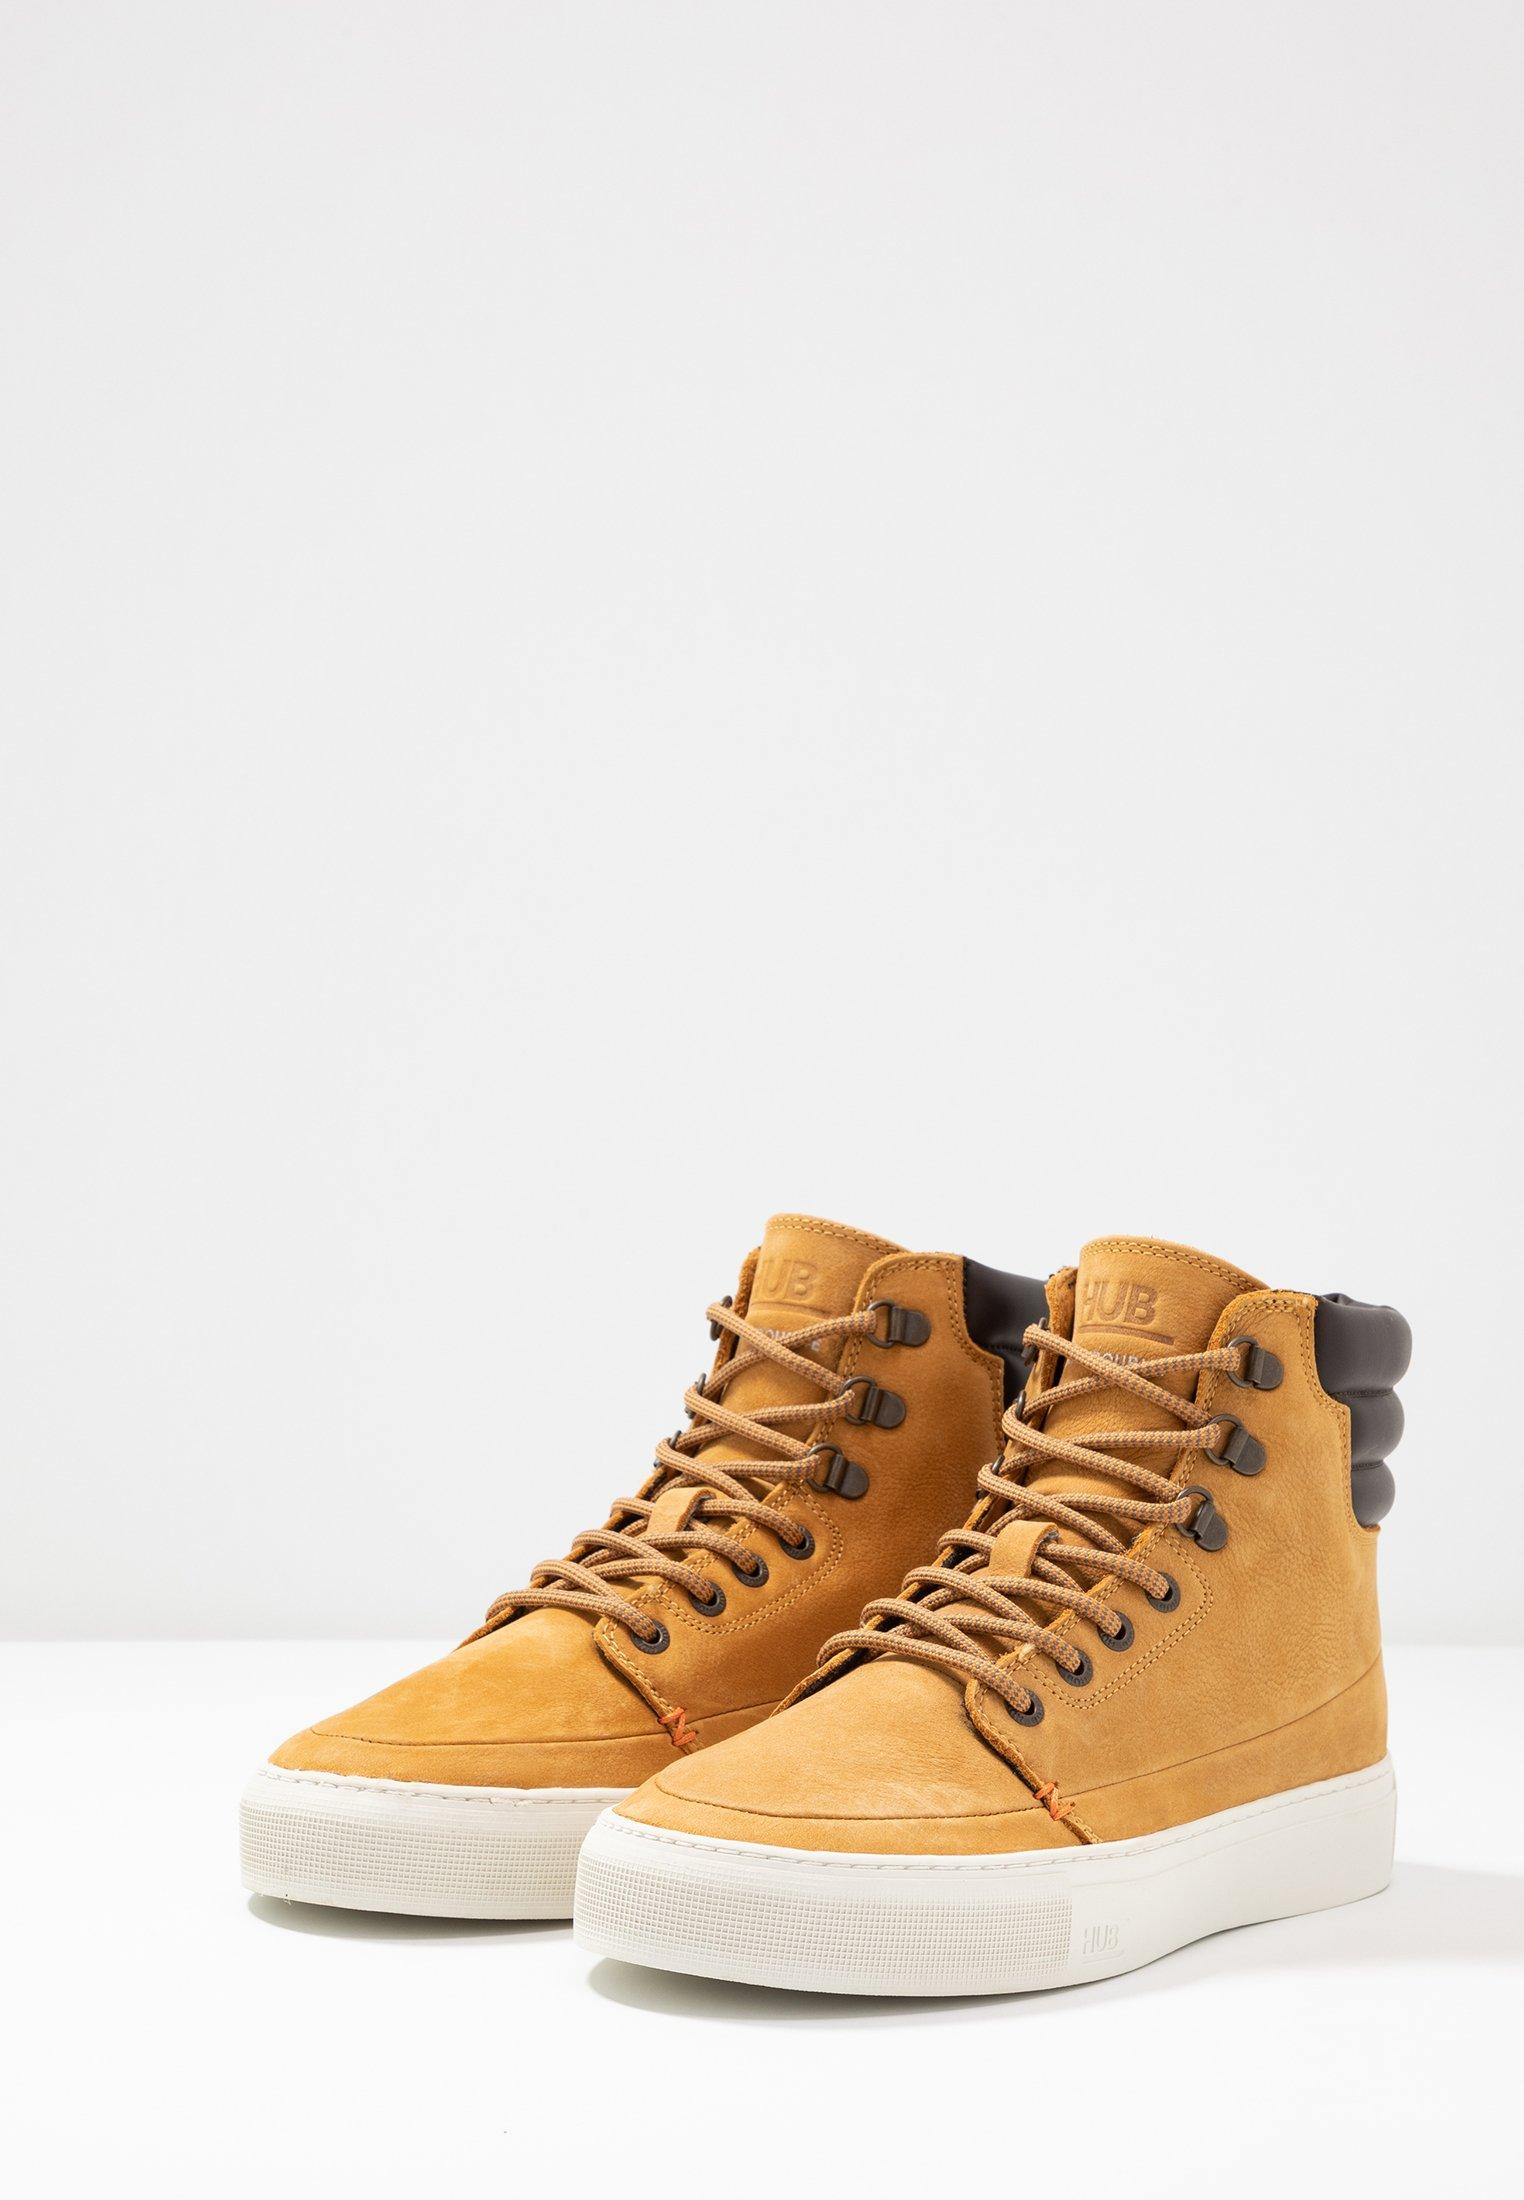 HUB EASTBOURNE - Sneaker high - honey brown/offwhite/tan - Herrenschuhe OfsCN